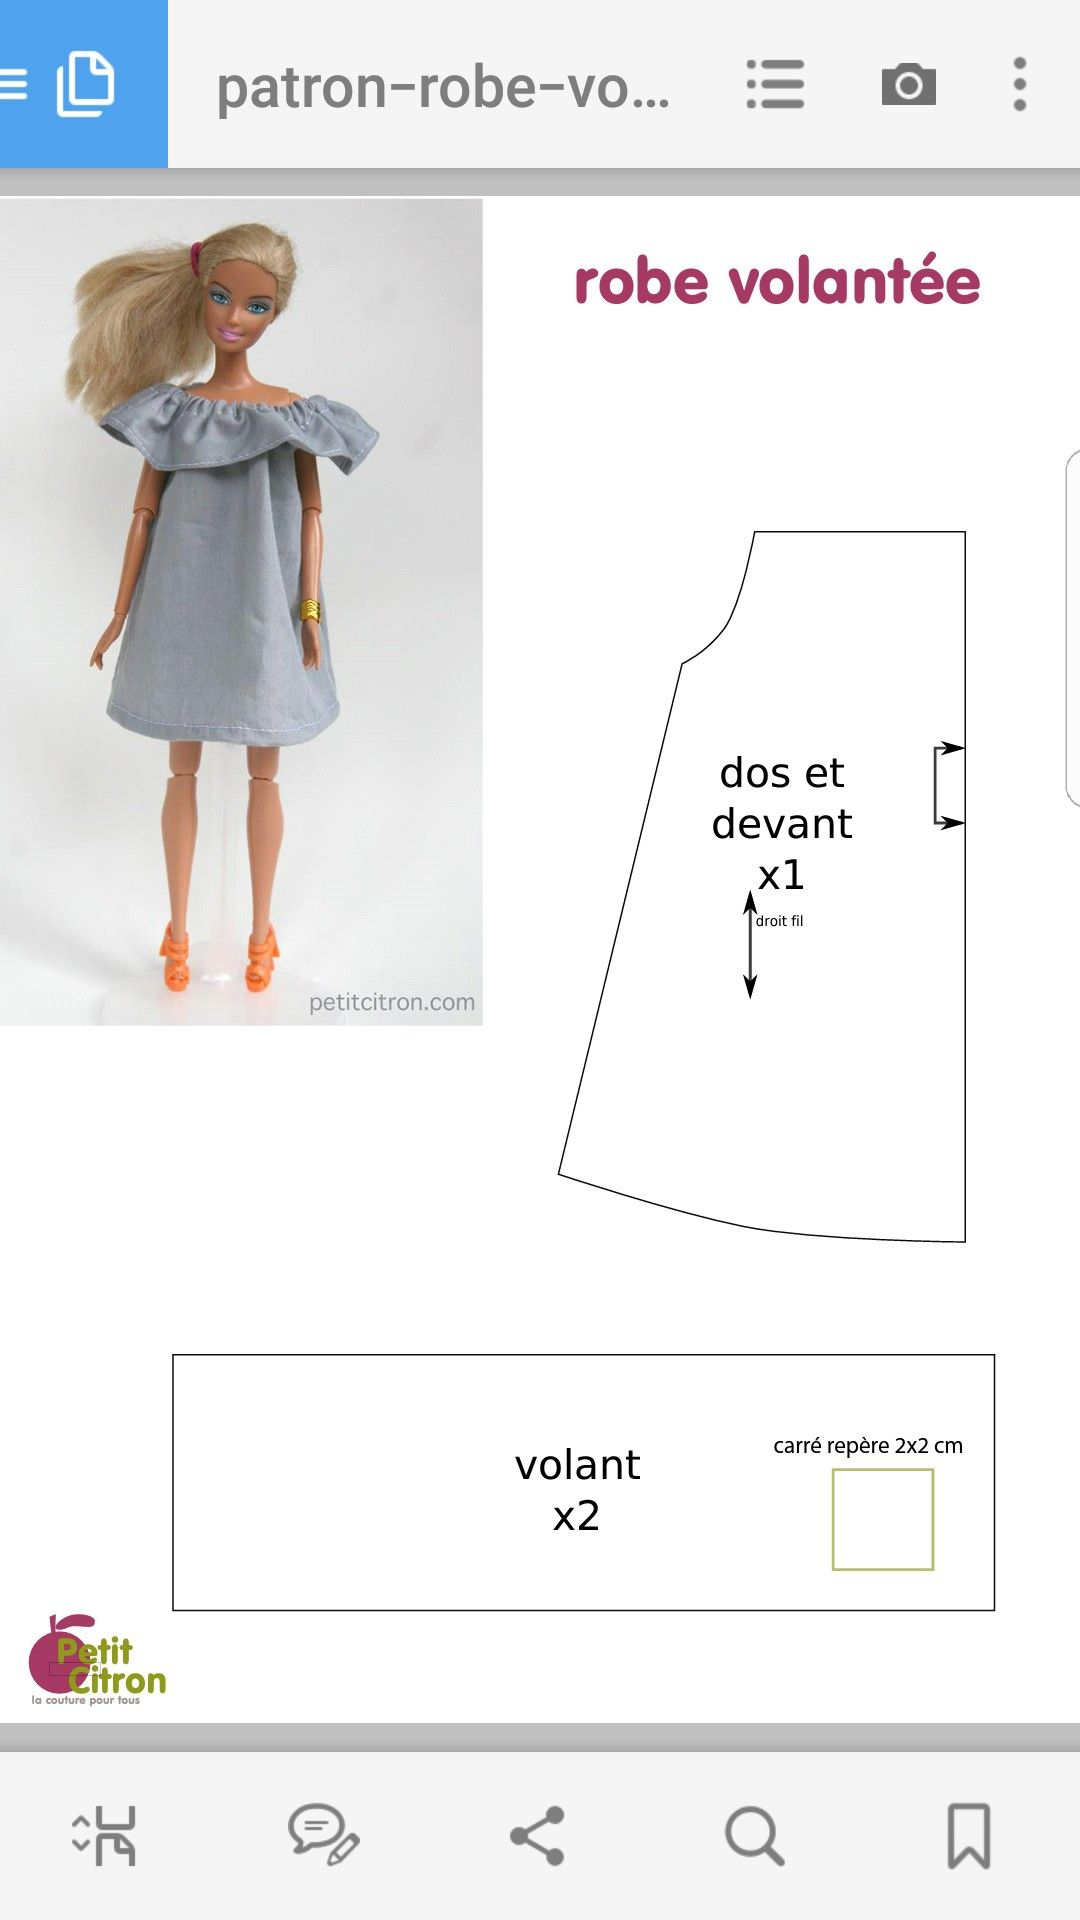 Robe de barbies | Barbie | Pinterest | Barbie, Ropa de muñeca y Muñecas